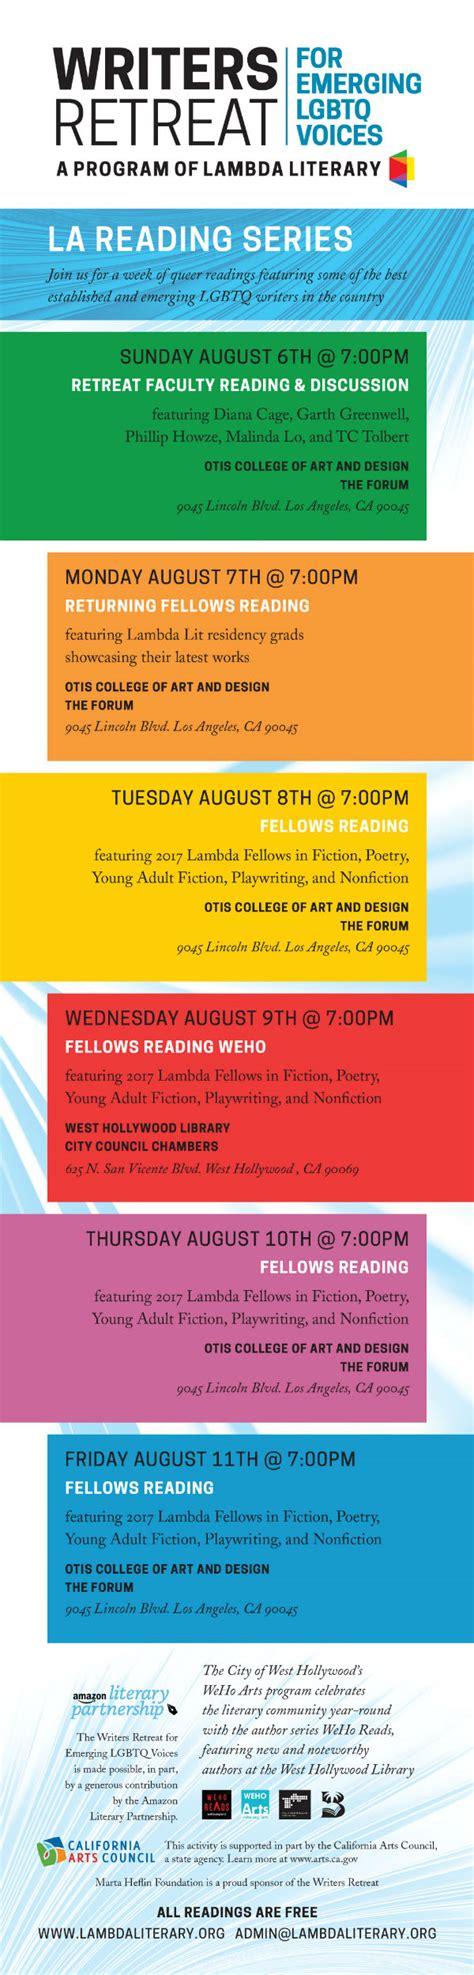 the literary conference series 1 lambda literary